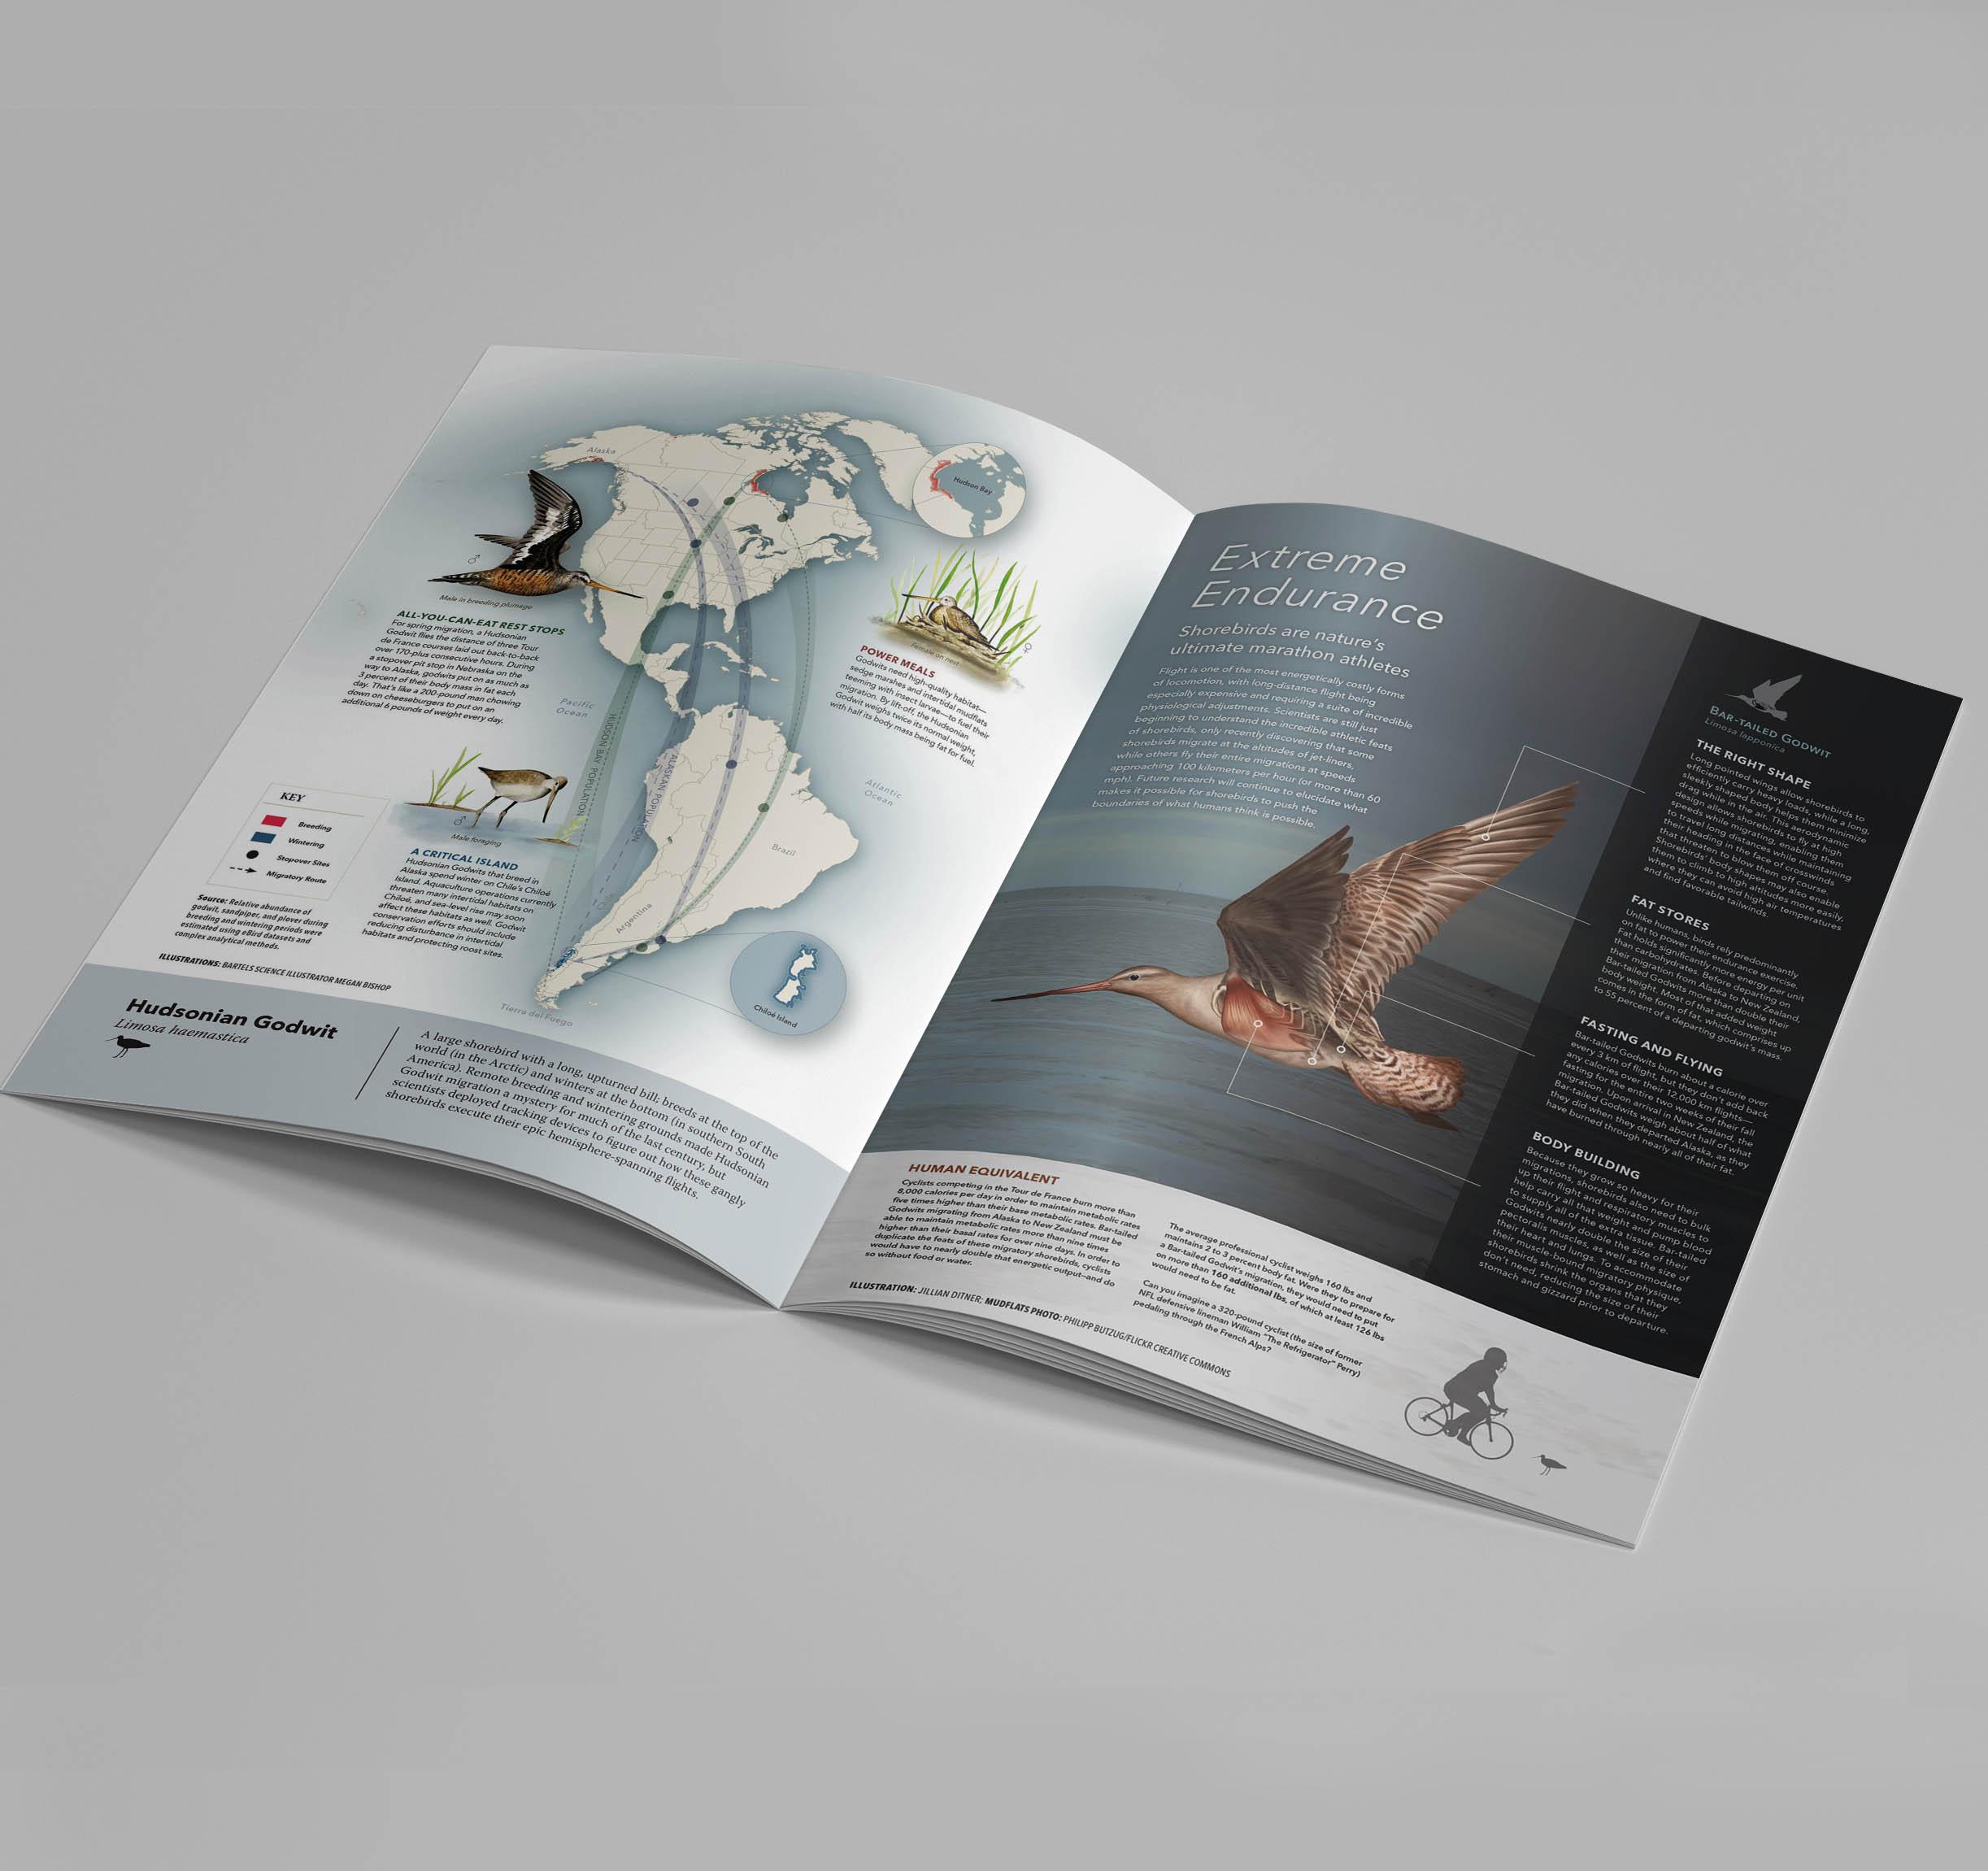 Shorebirds Foldout Feature